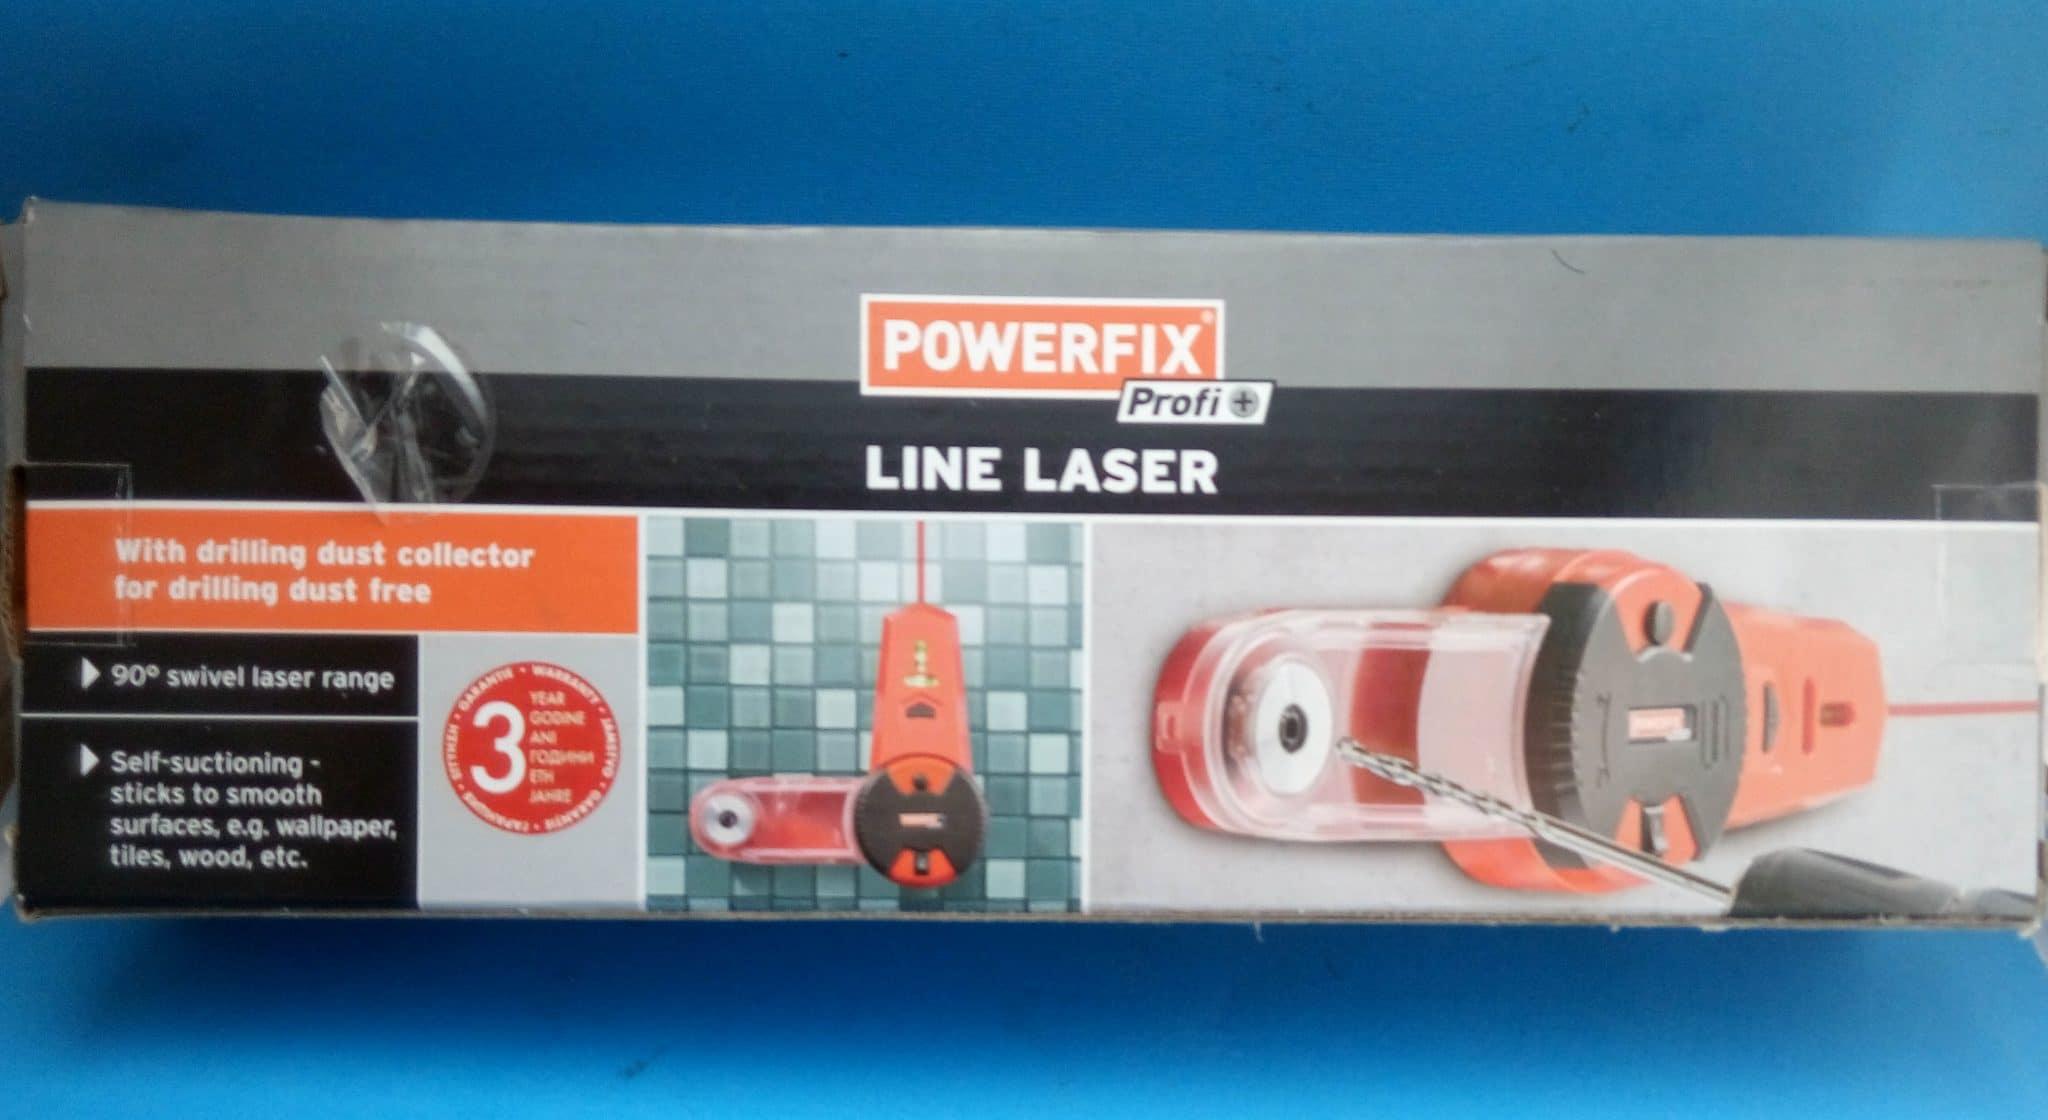 powerfix-line-laser-plbs-2a1_2_v1